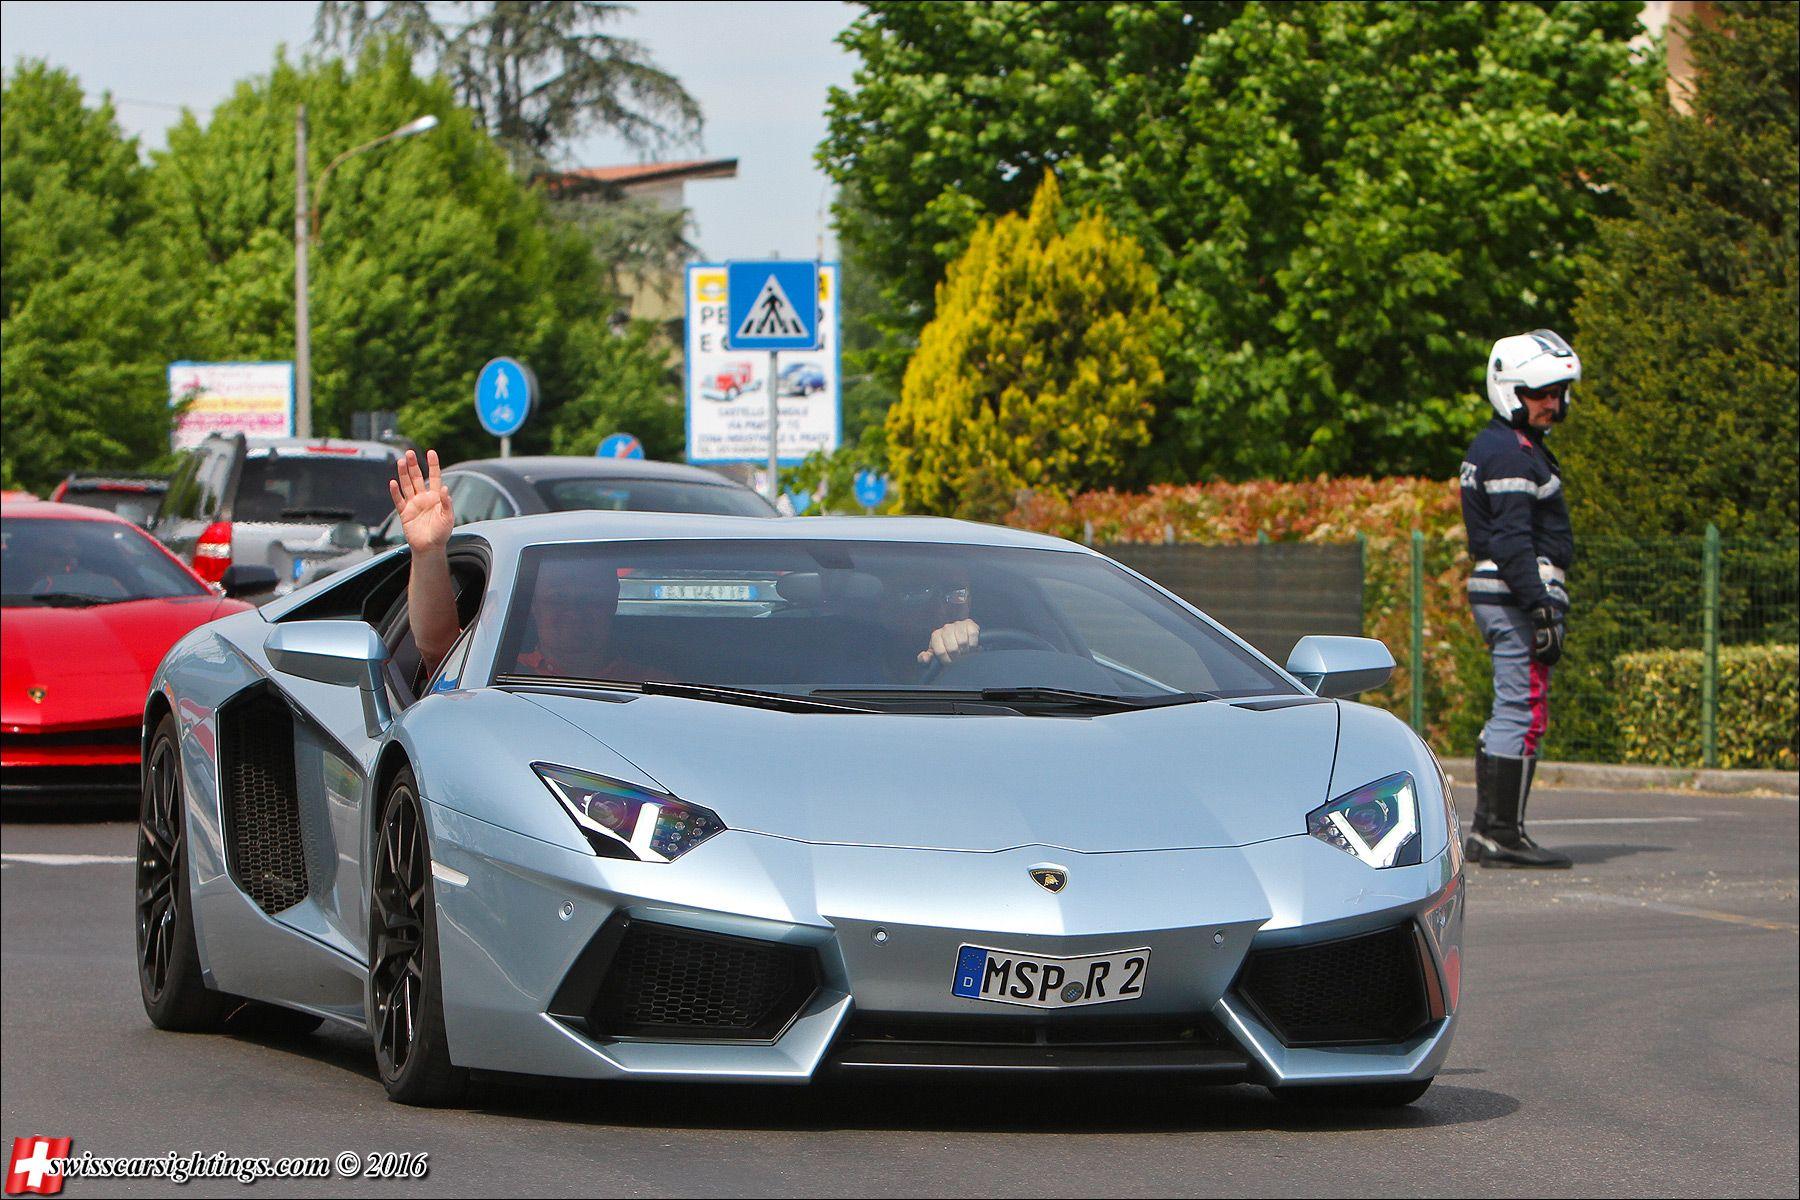 96d265e24420675fdaee57f1fa0f5753 Breathtaking Price Of Lamborghini Huracán Lp 610 4 Cars Trend